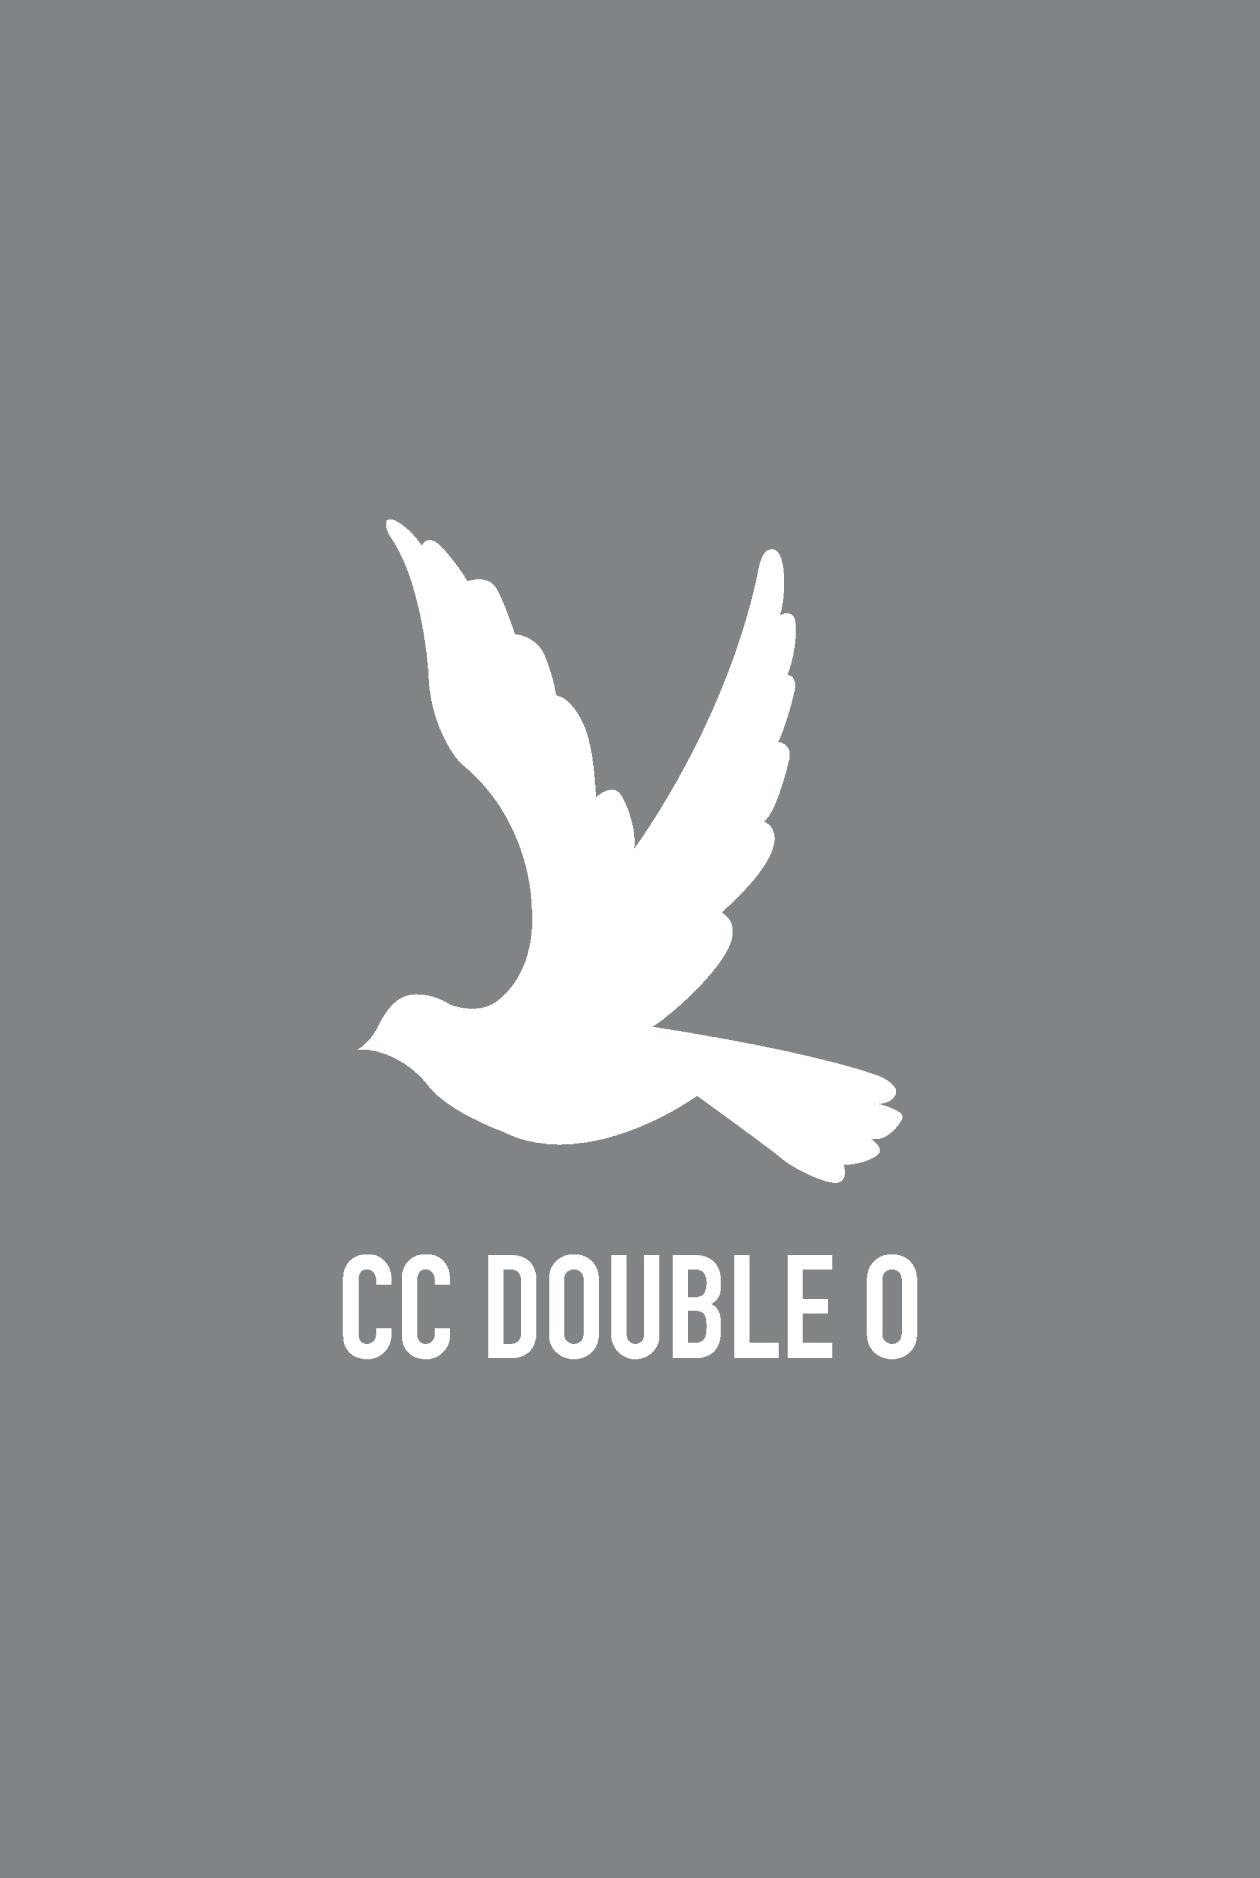 Bird Logo Long-Sleeved V-Neck Tee with CC DOUBLE O Sleeve Detail